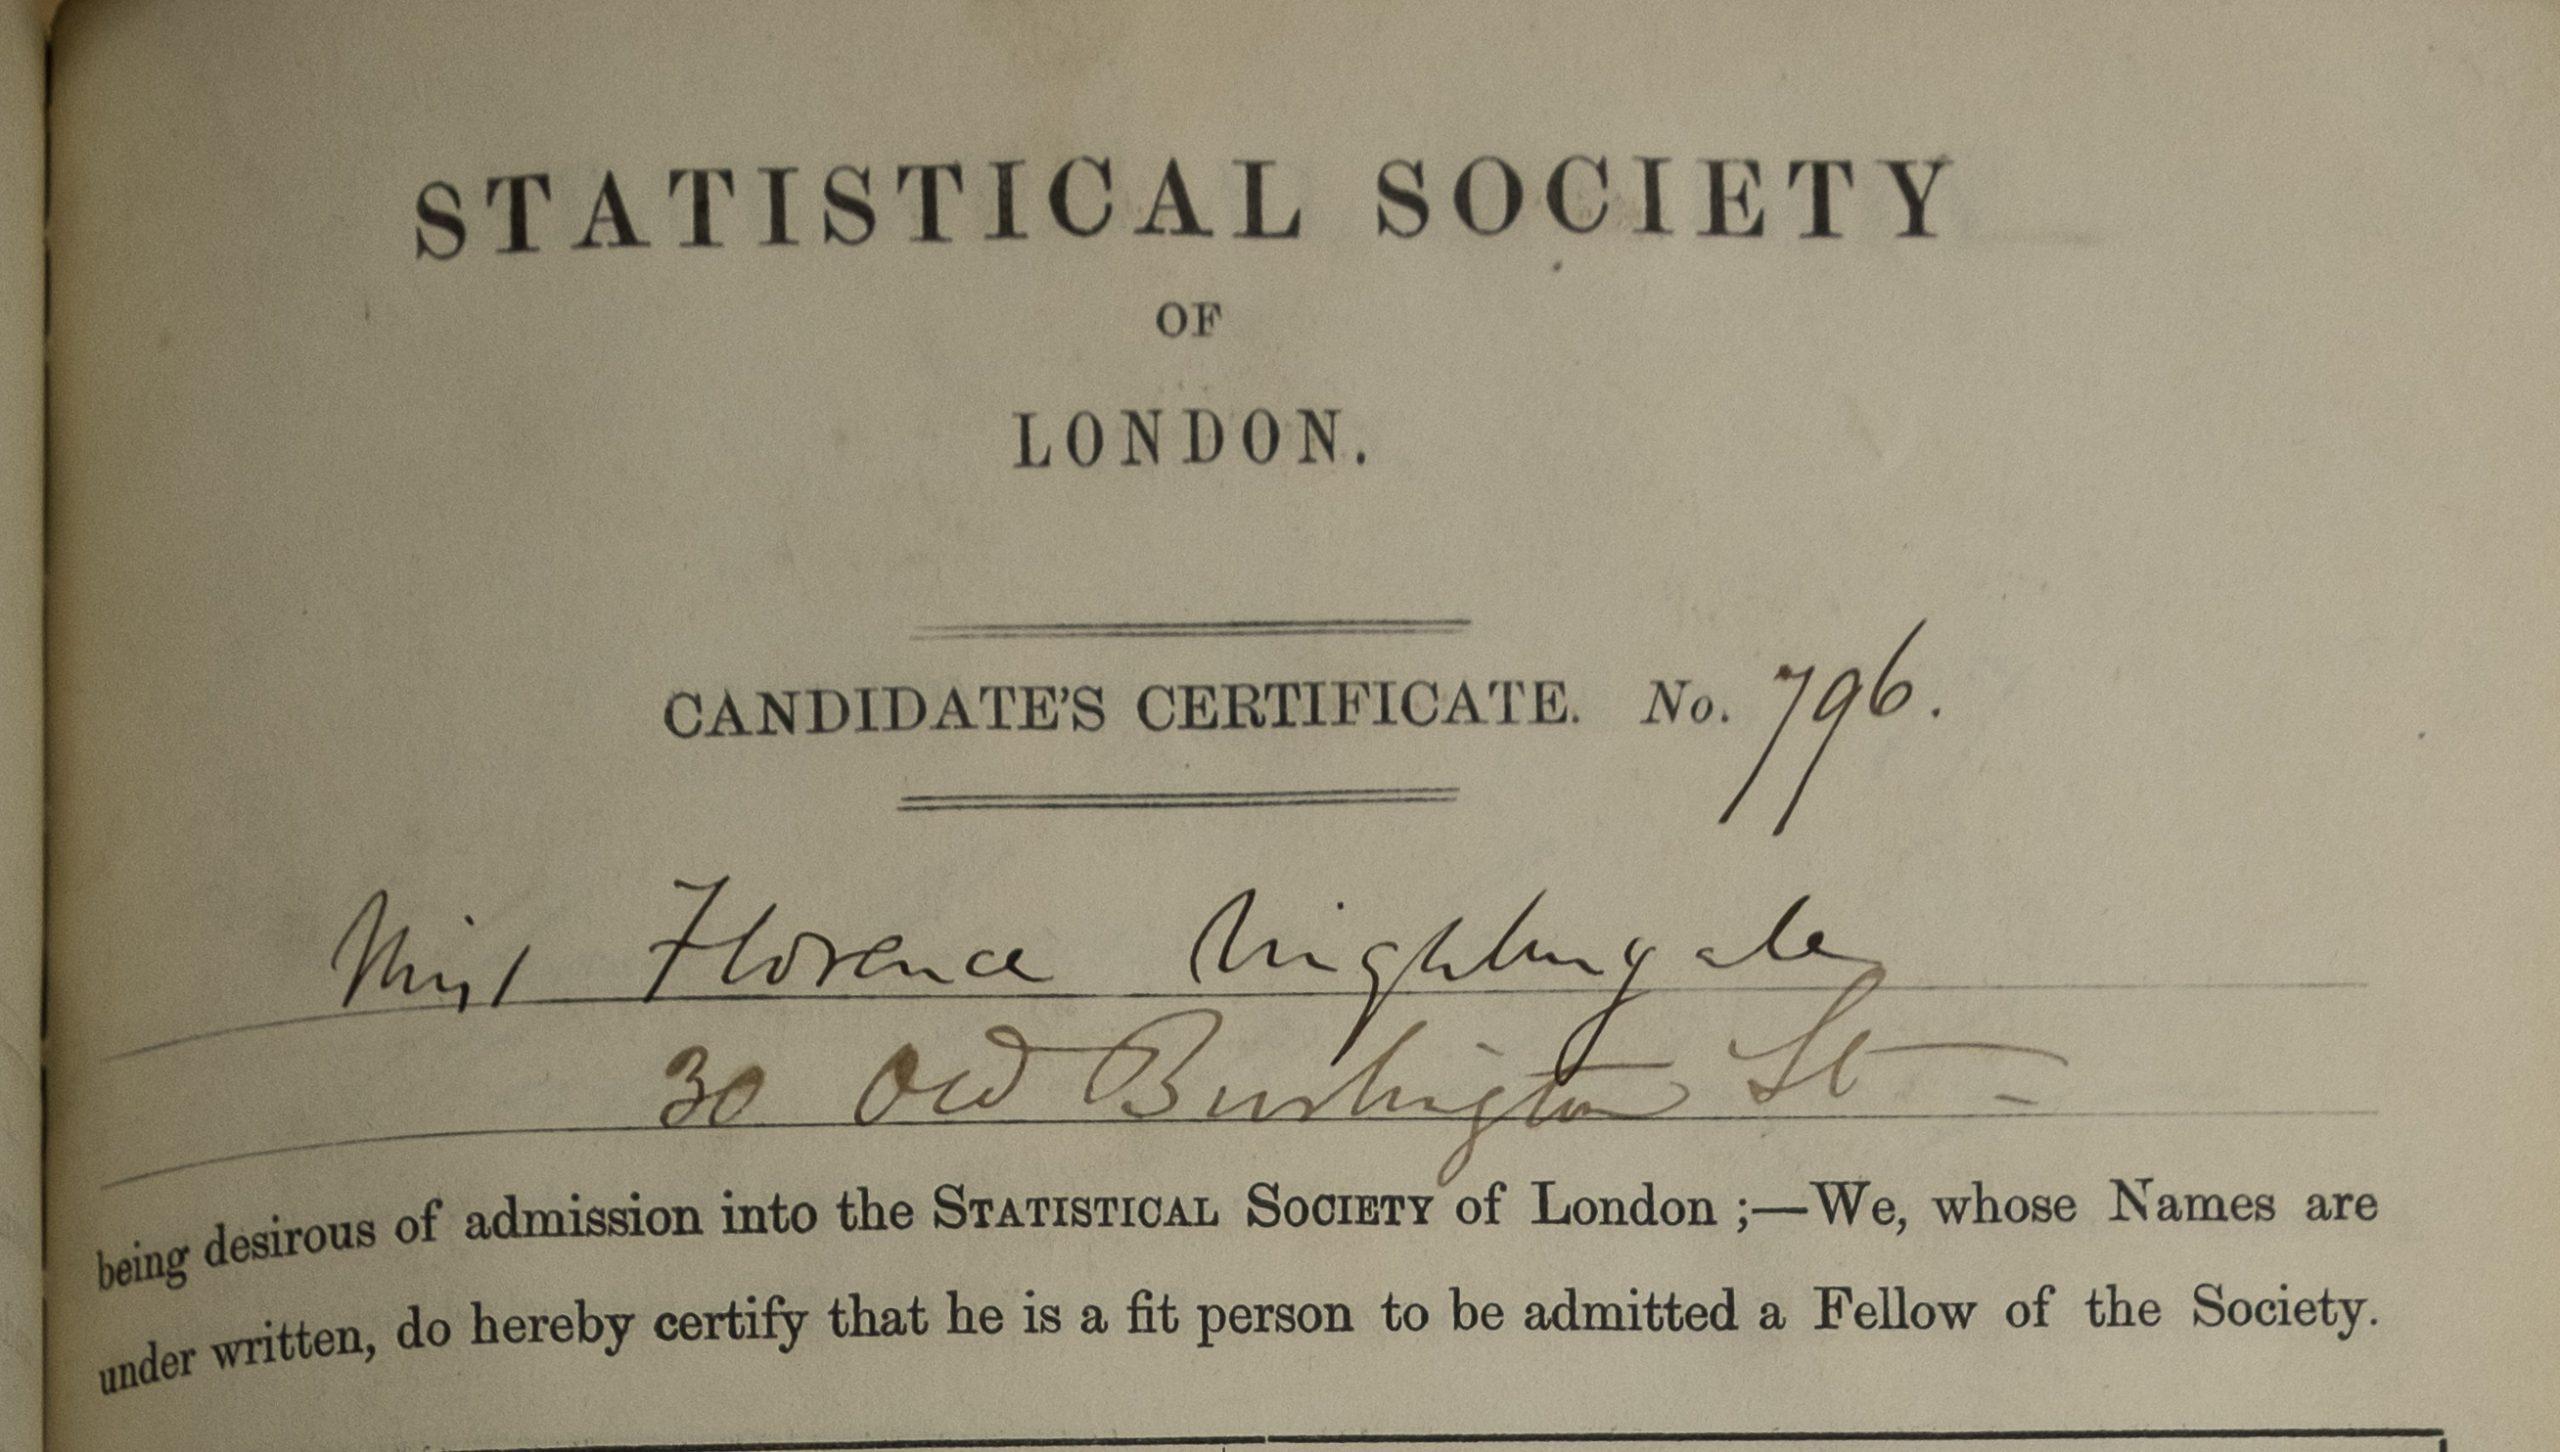 RSS nomination form